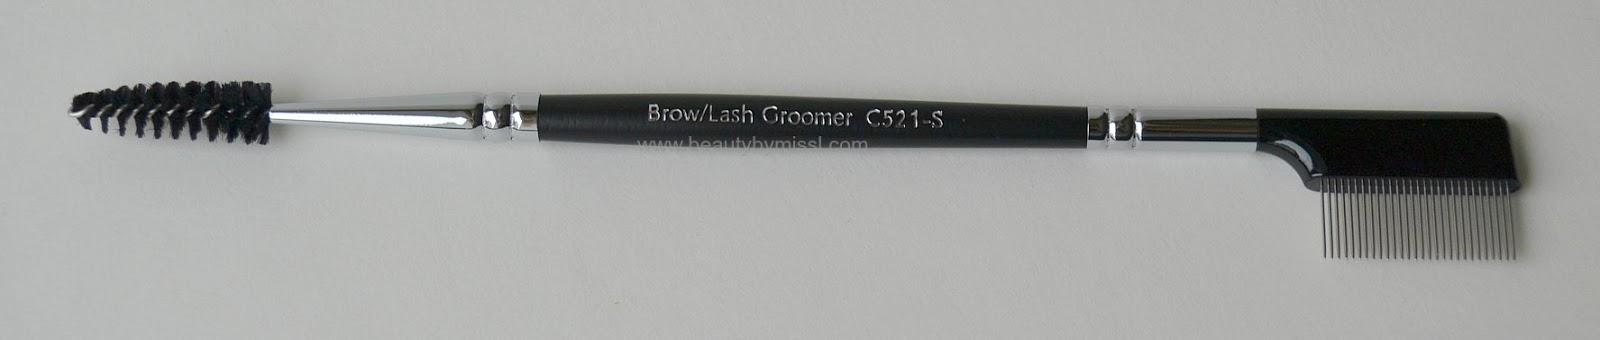 Royal & Langnickel Brow/Lash Groomer C521-S